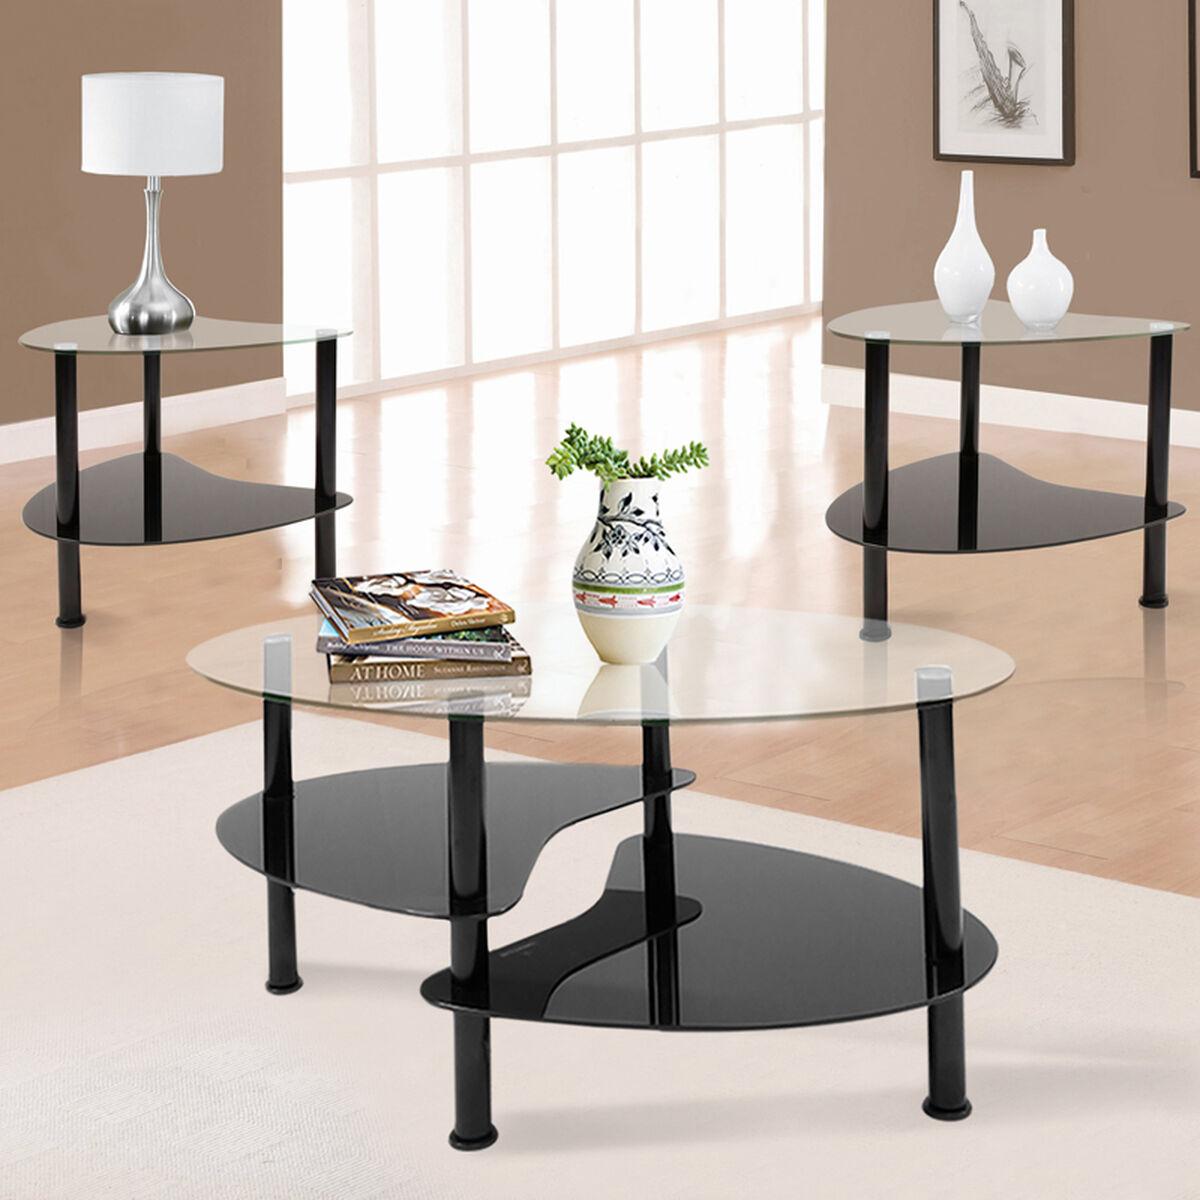 Home Furnishing Websites: Innovex Home Furnishings CE003G29-INV